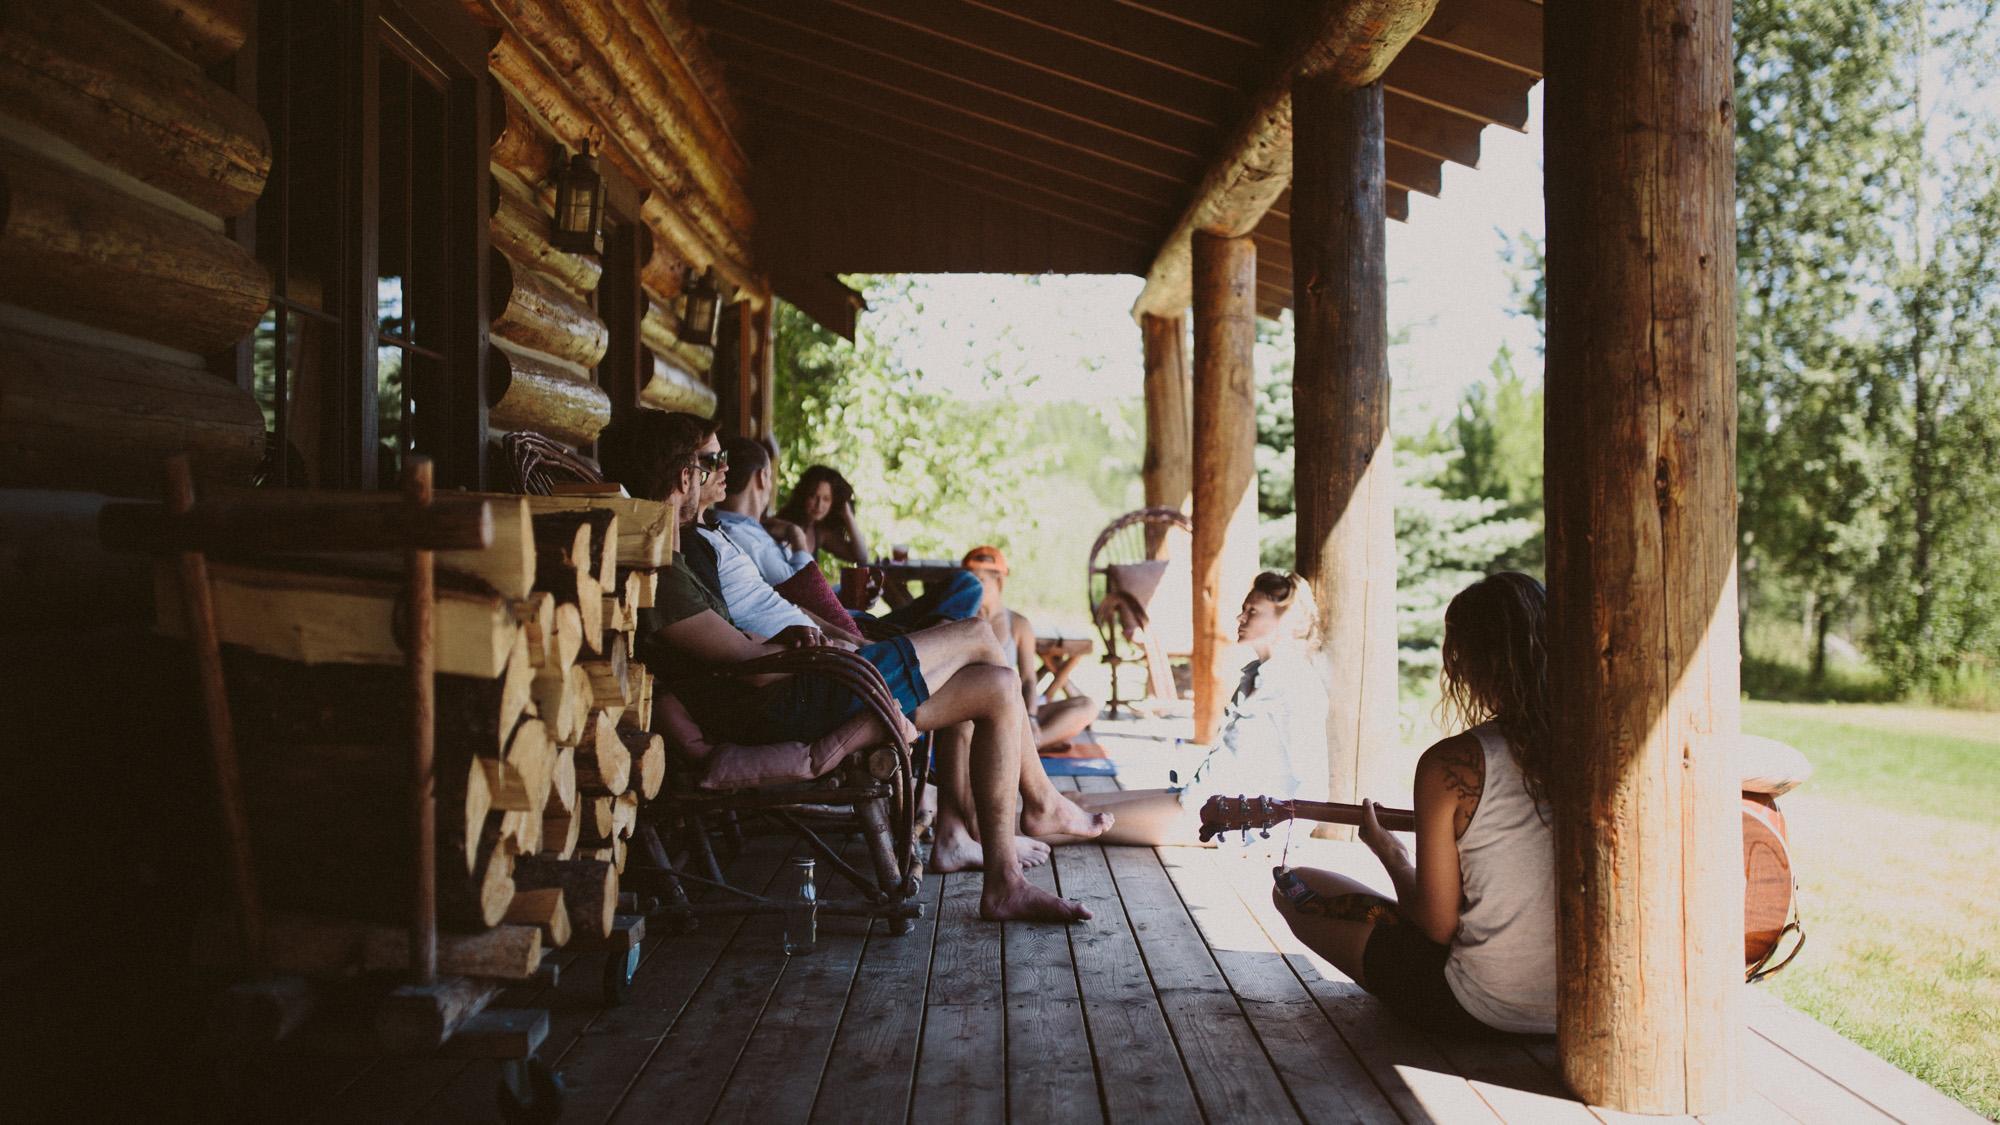 Montana_Wedding_Photos_alec_vanderboom-0003.jpg